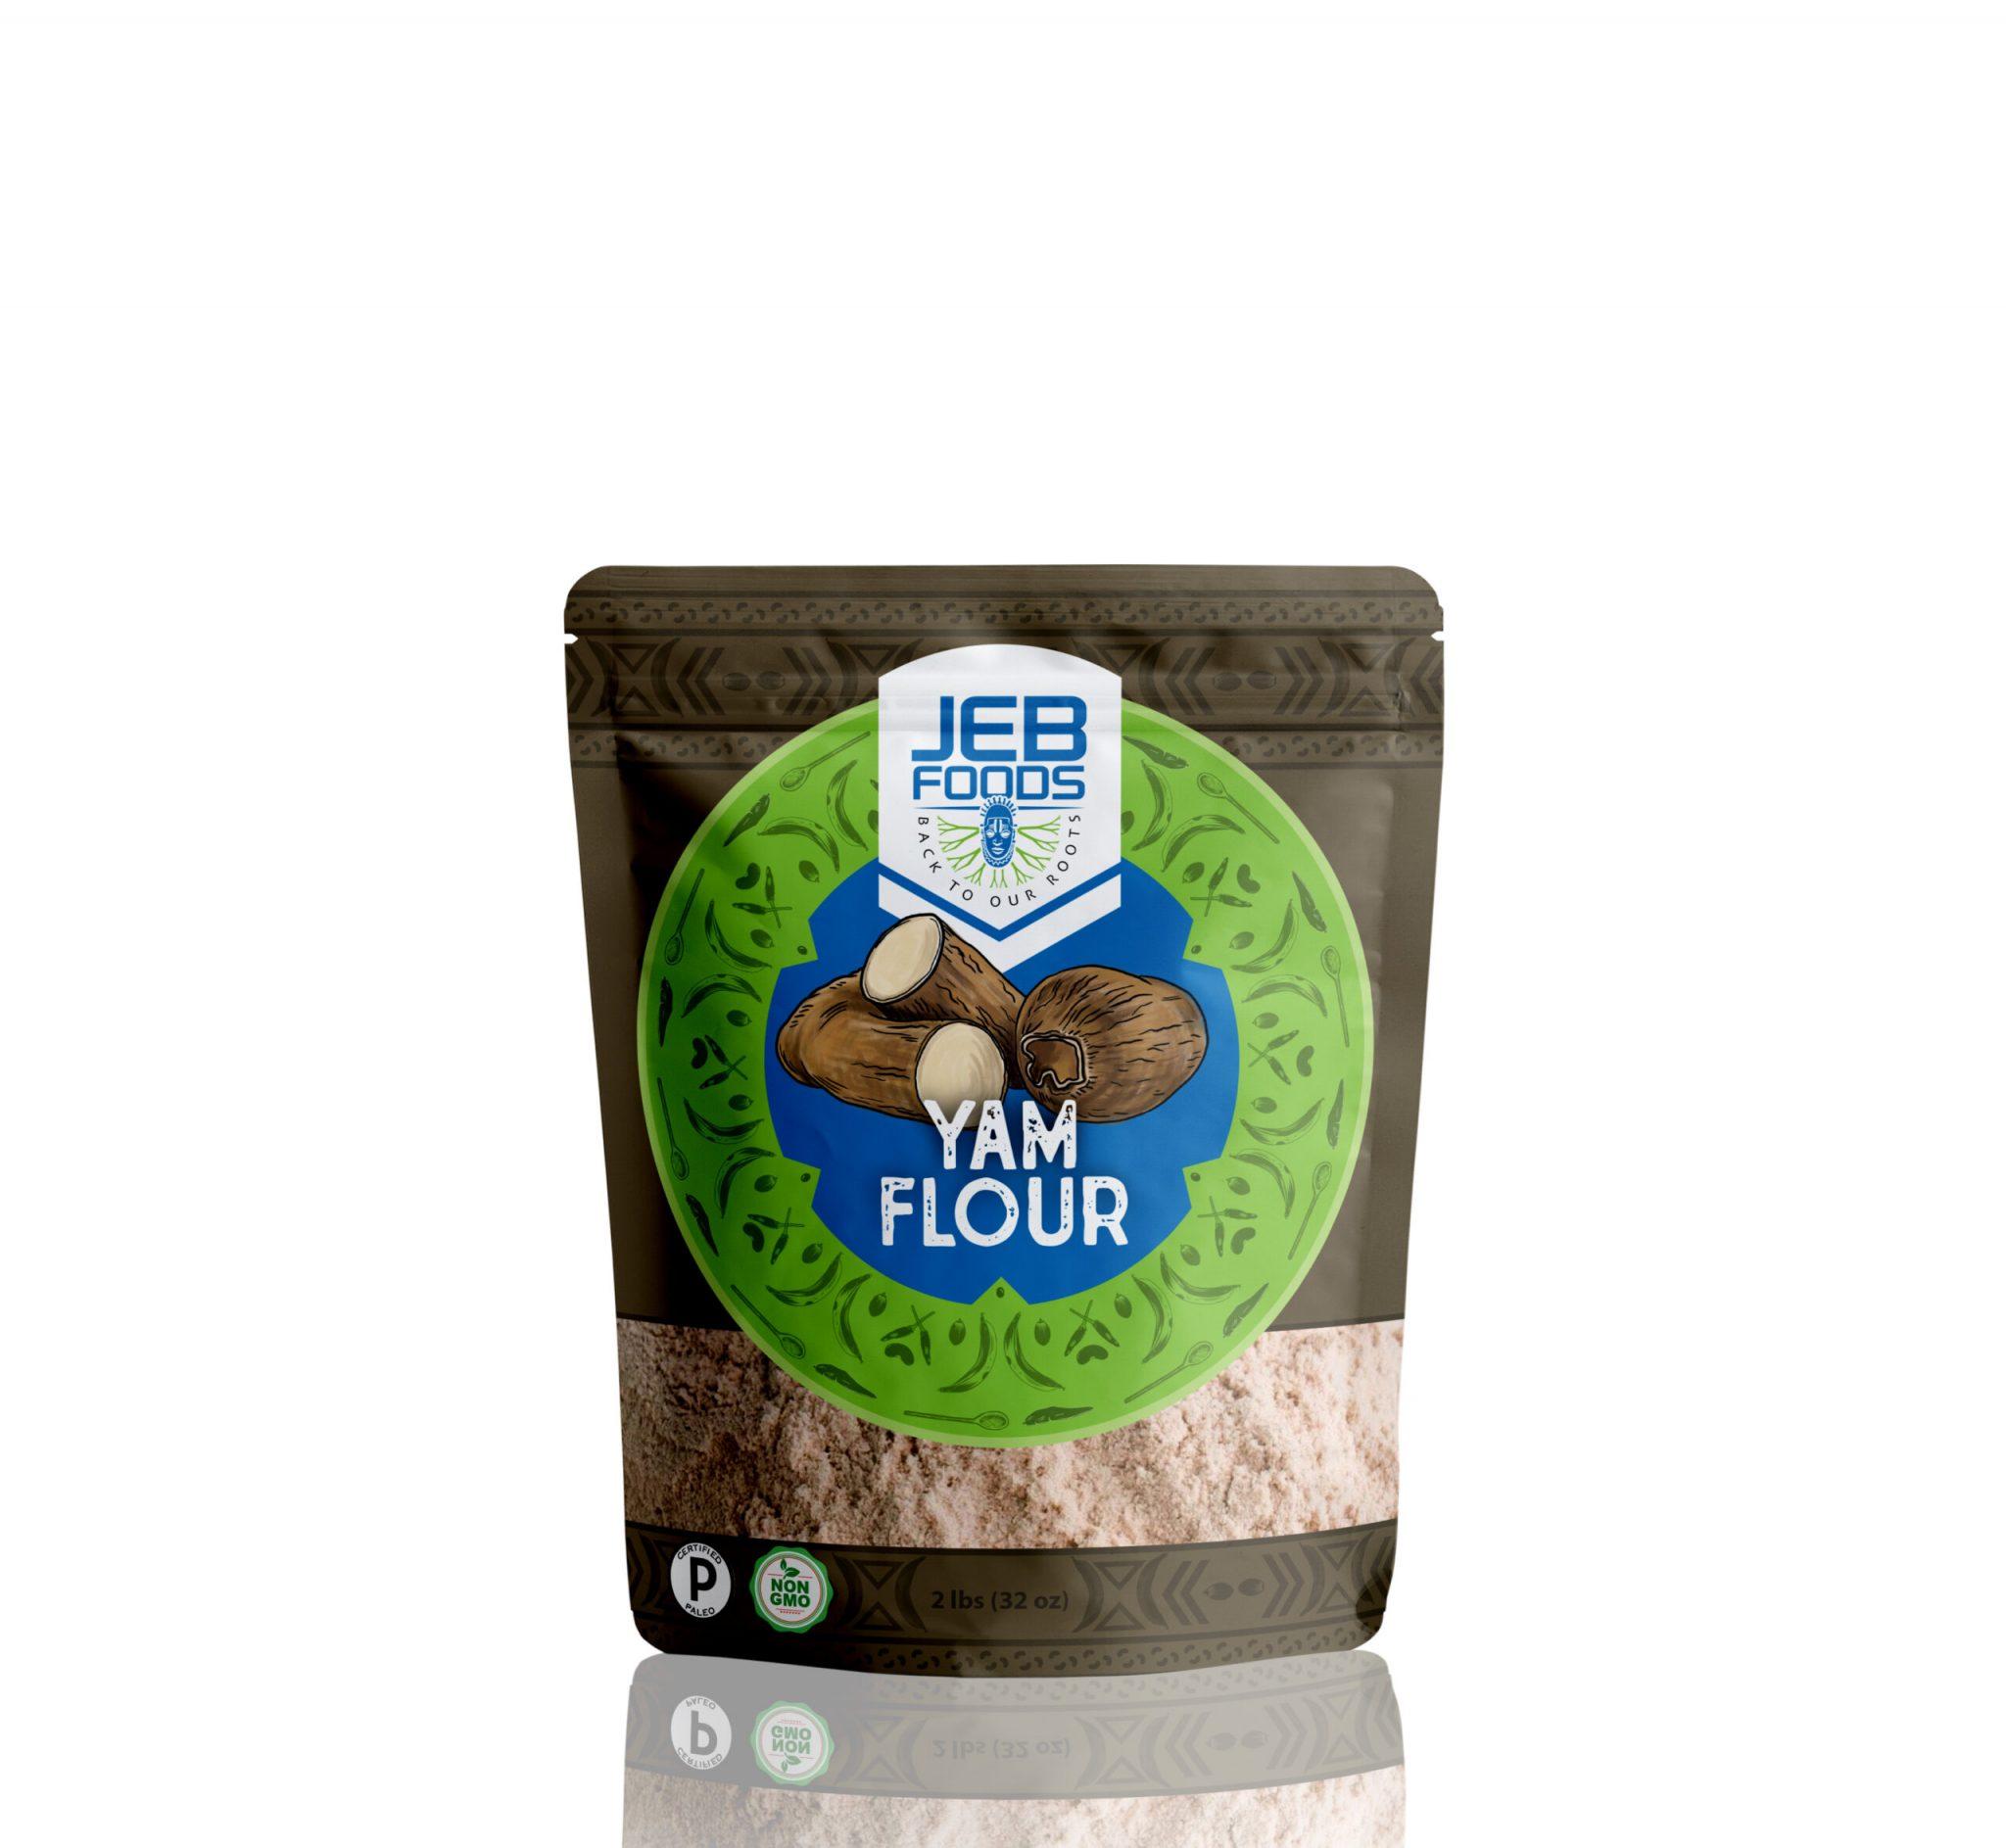 Yam Flour - Jeb Foods - Grain Free Certified Paleo Keto Certified by the Paleo Foundation